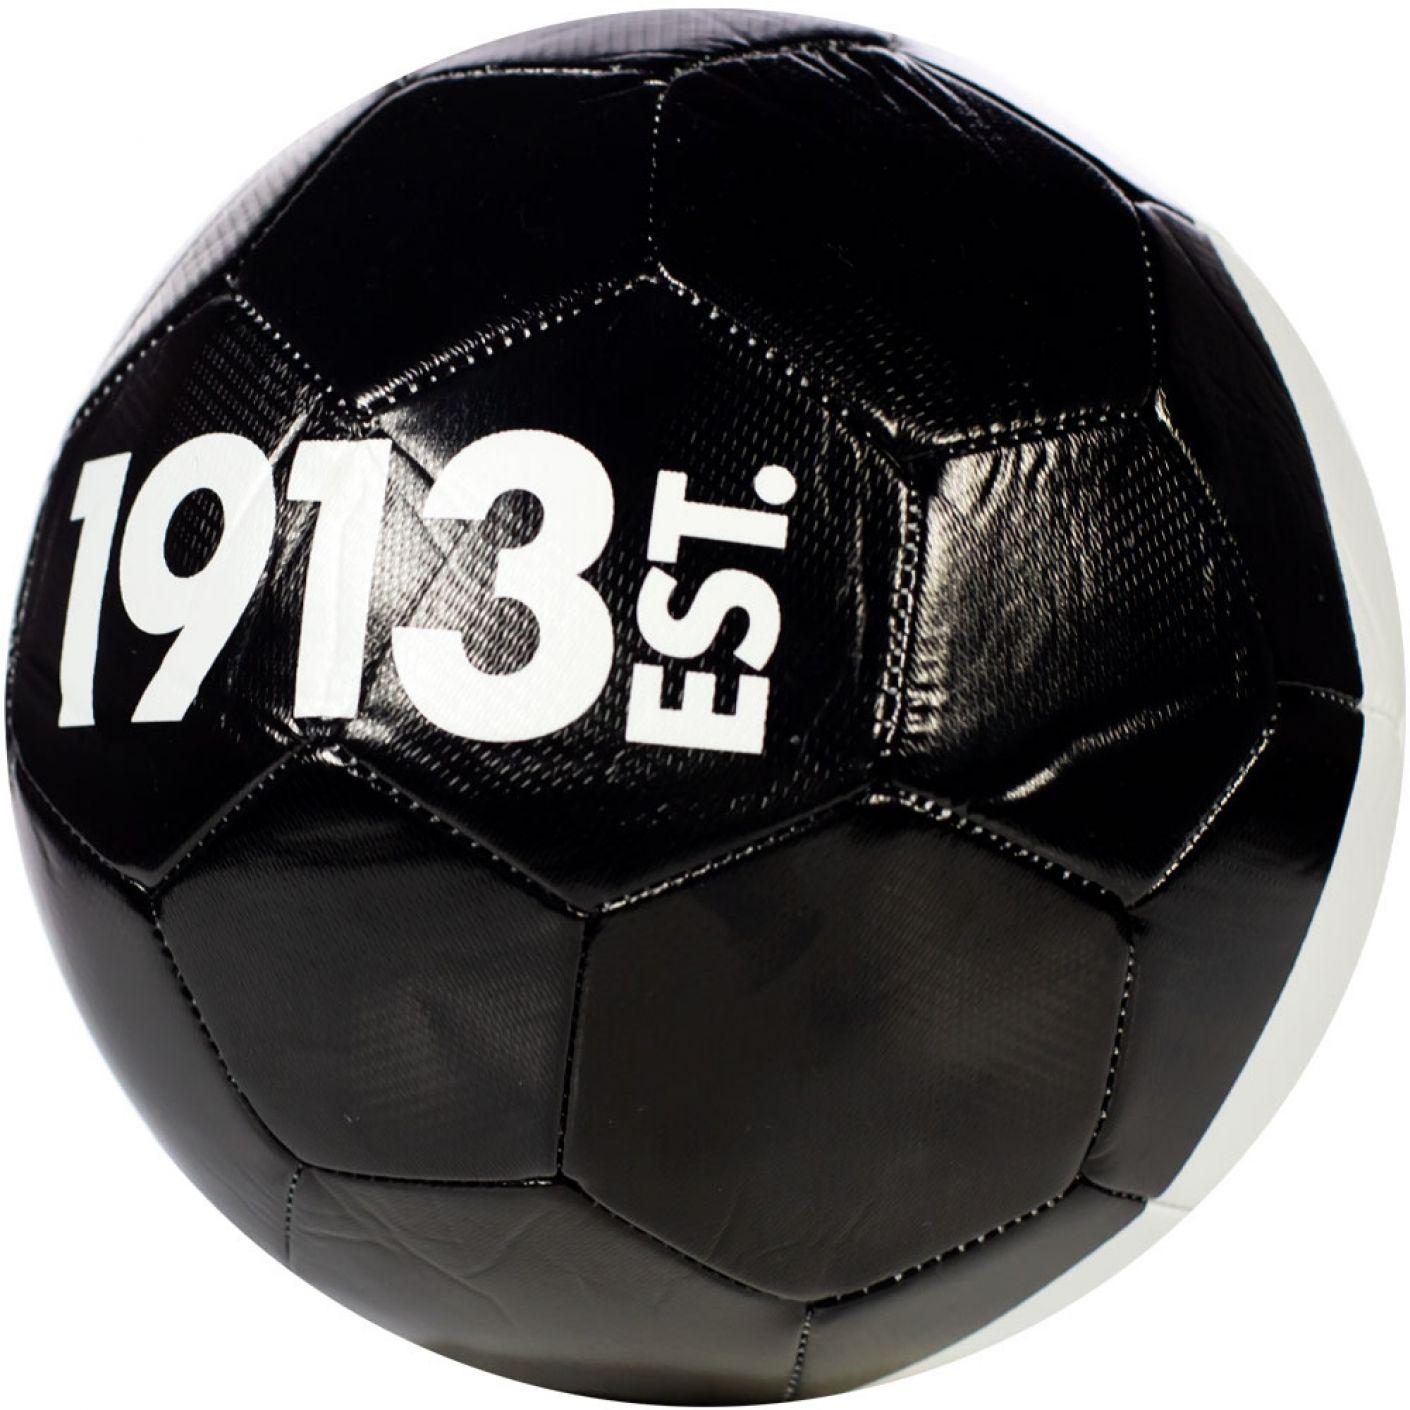 1913 bal zwart-wit